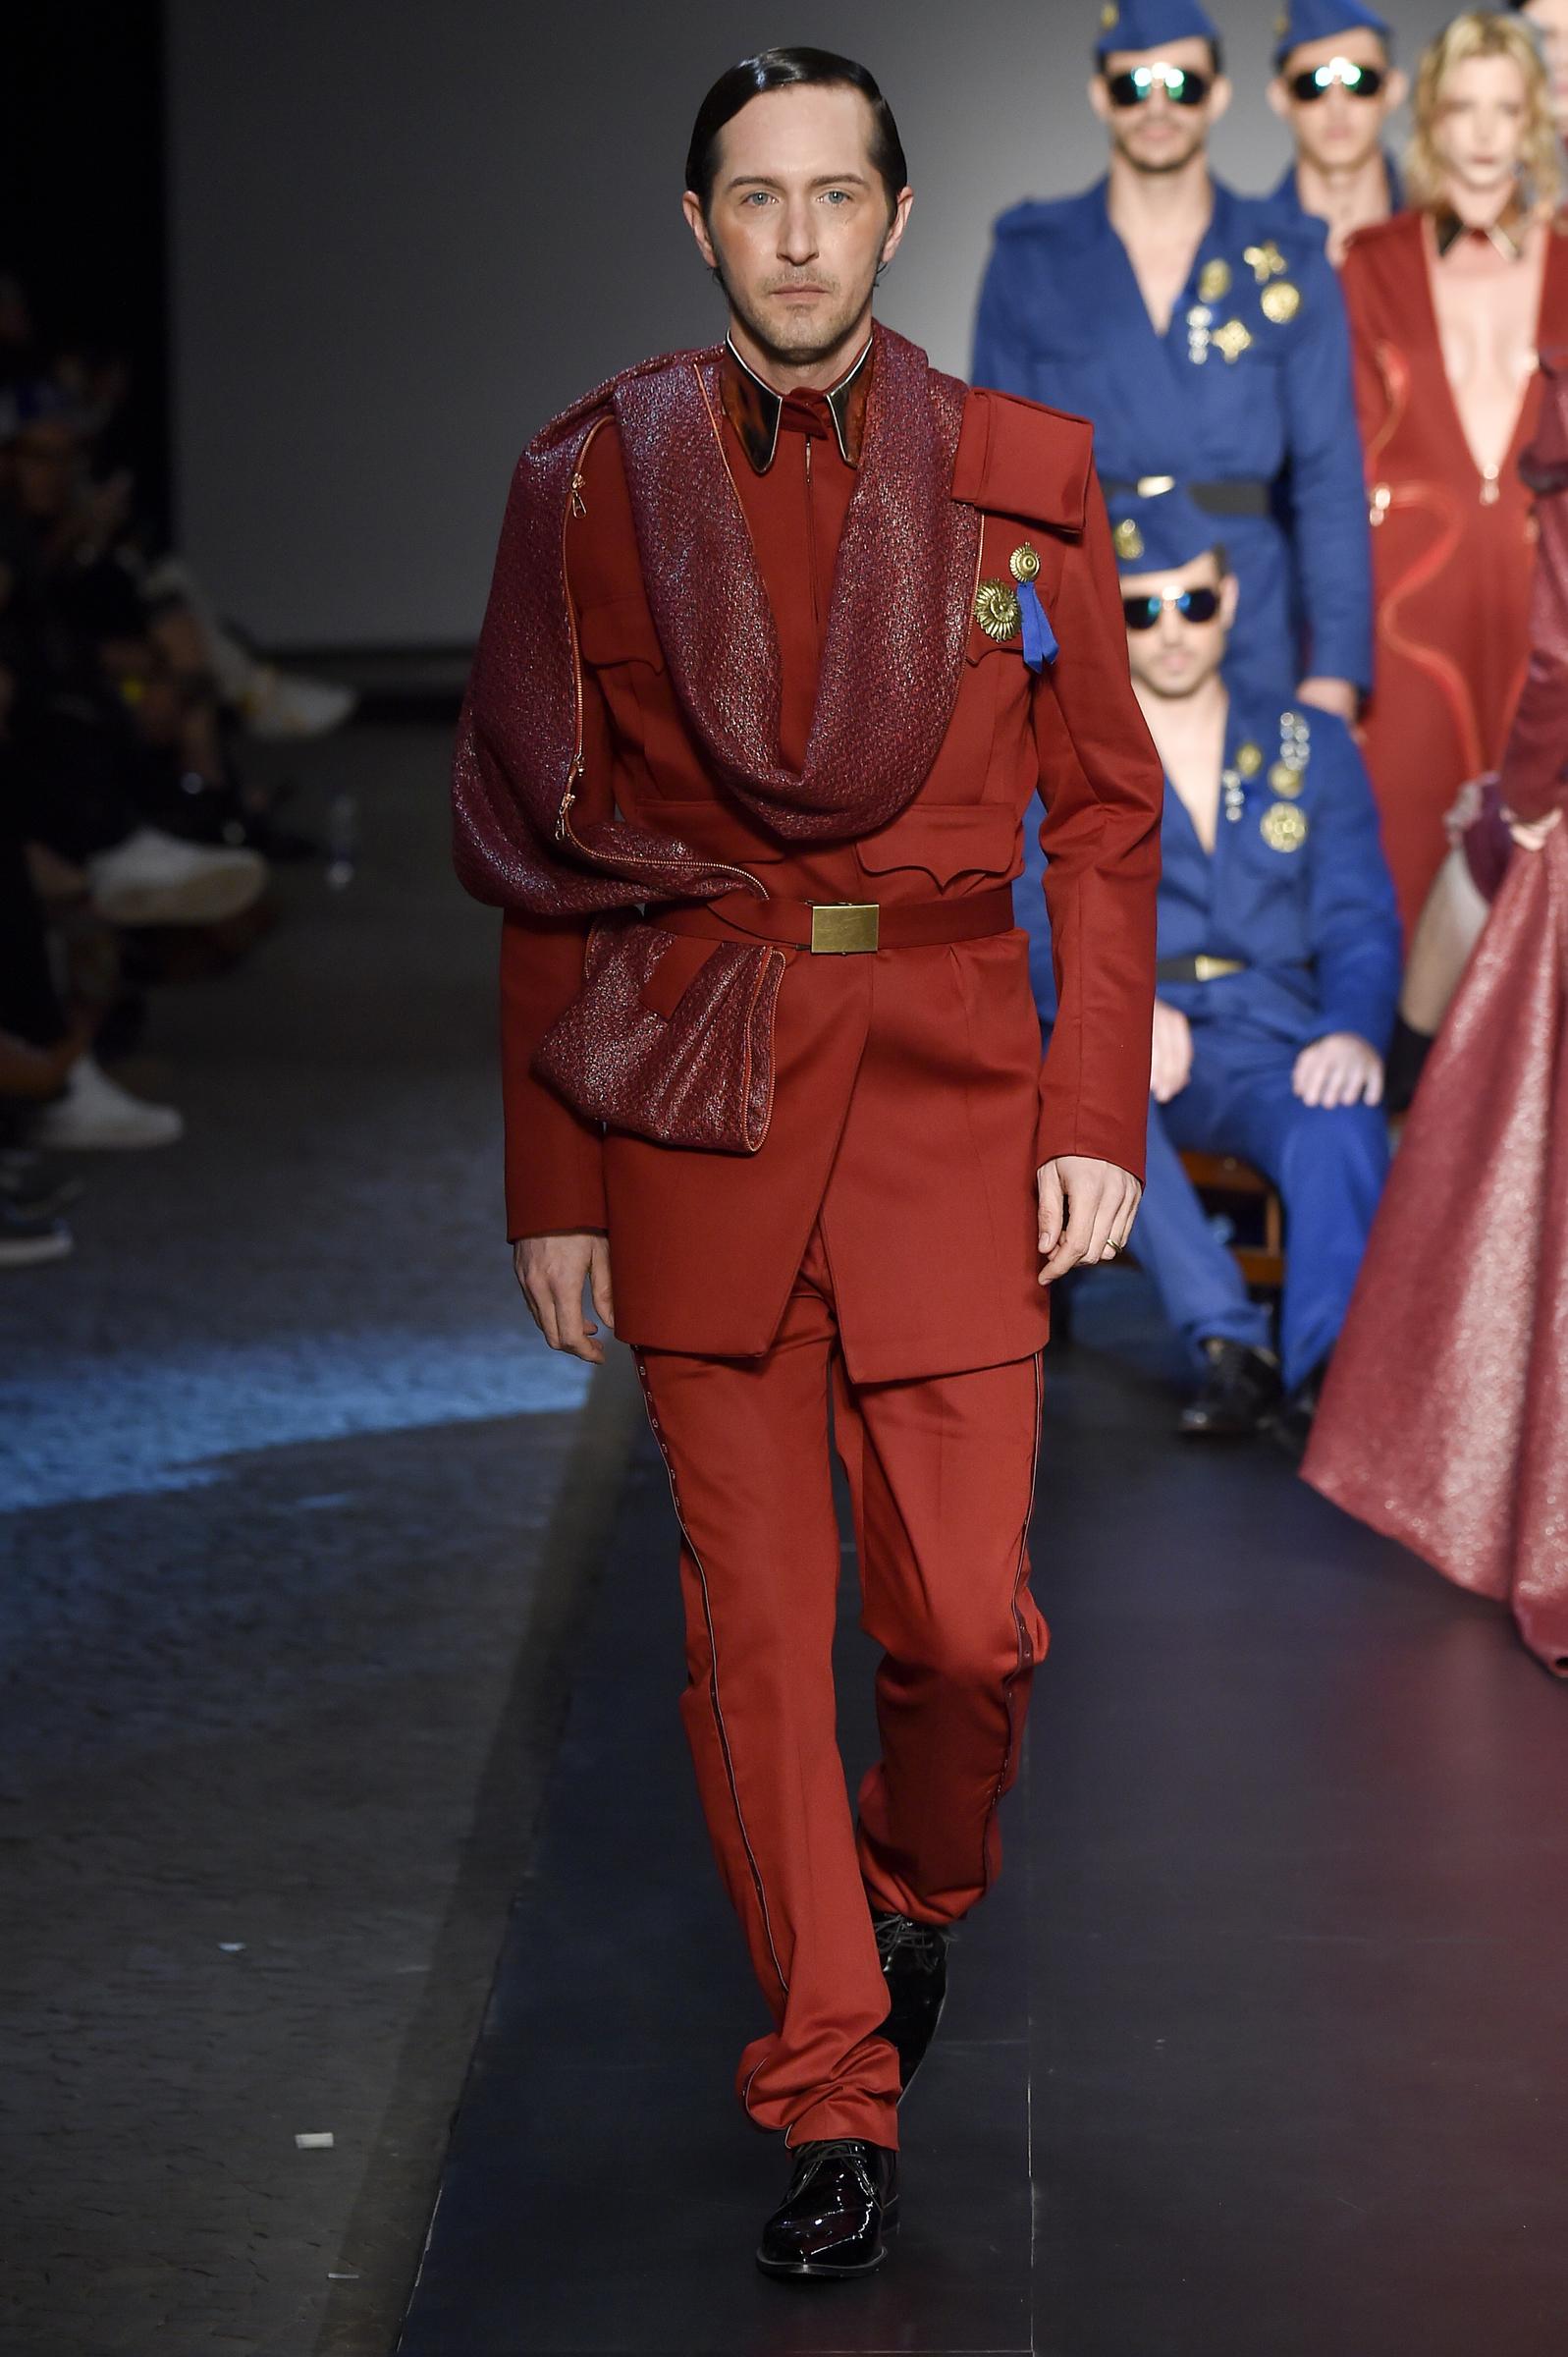 Arnaldo Ventura, inverno 2016, moda masculina, casa de criadores, roupa masculina, estilo masculino, menswear, fashion, fashion blogger, alex cursino, moda sem censura, 6